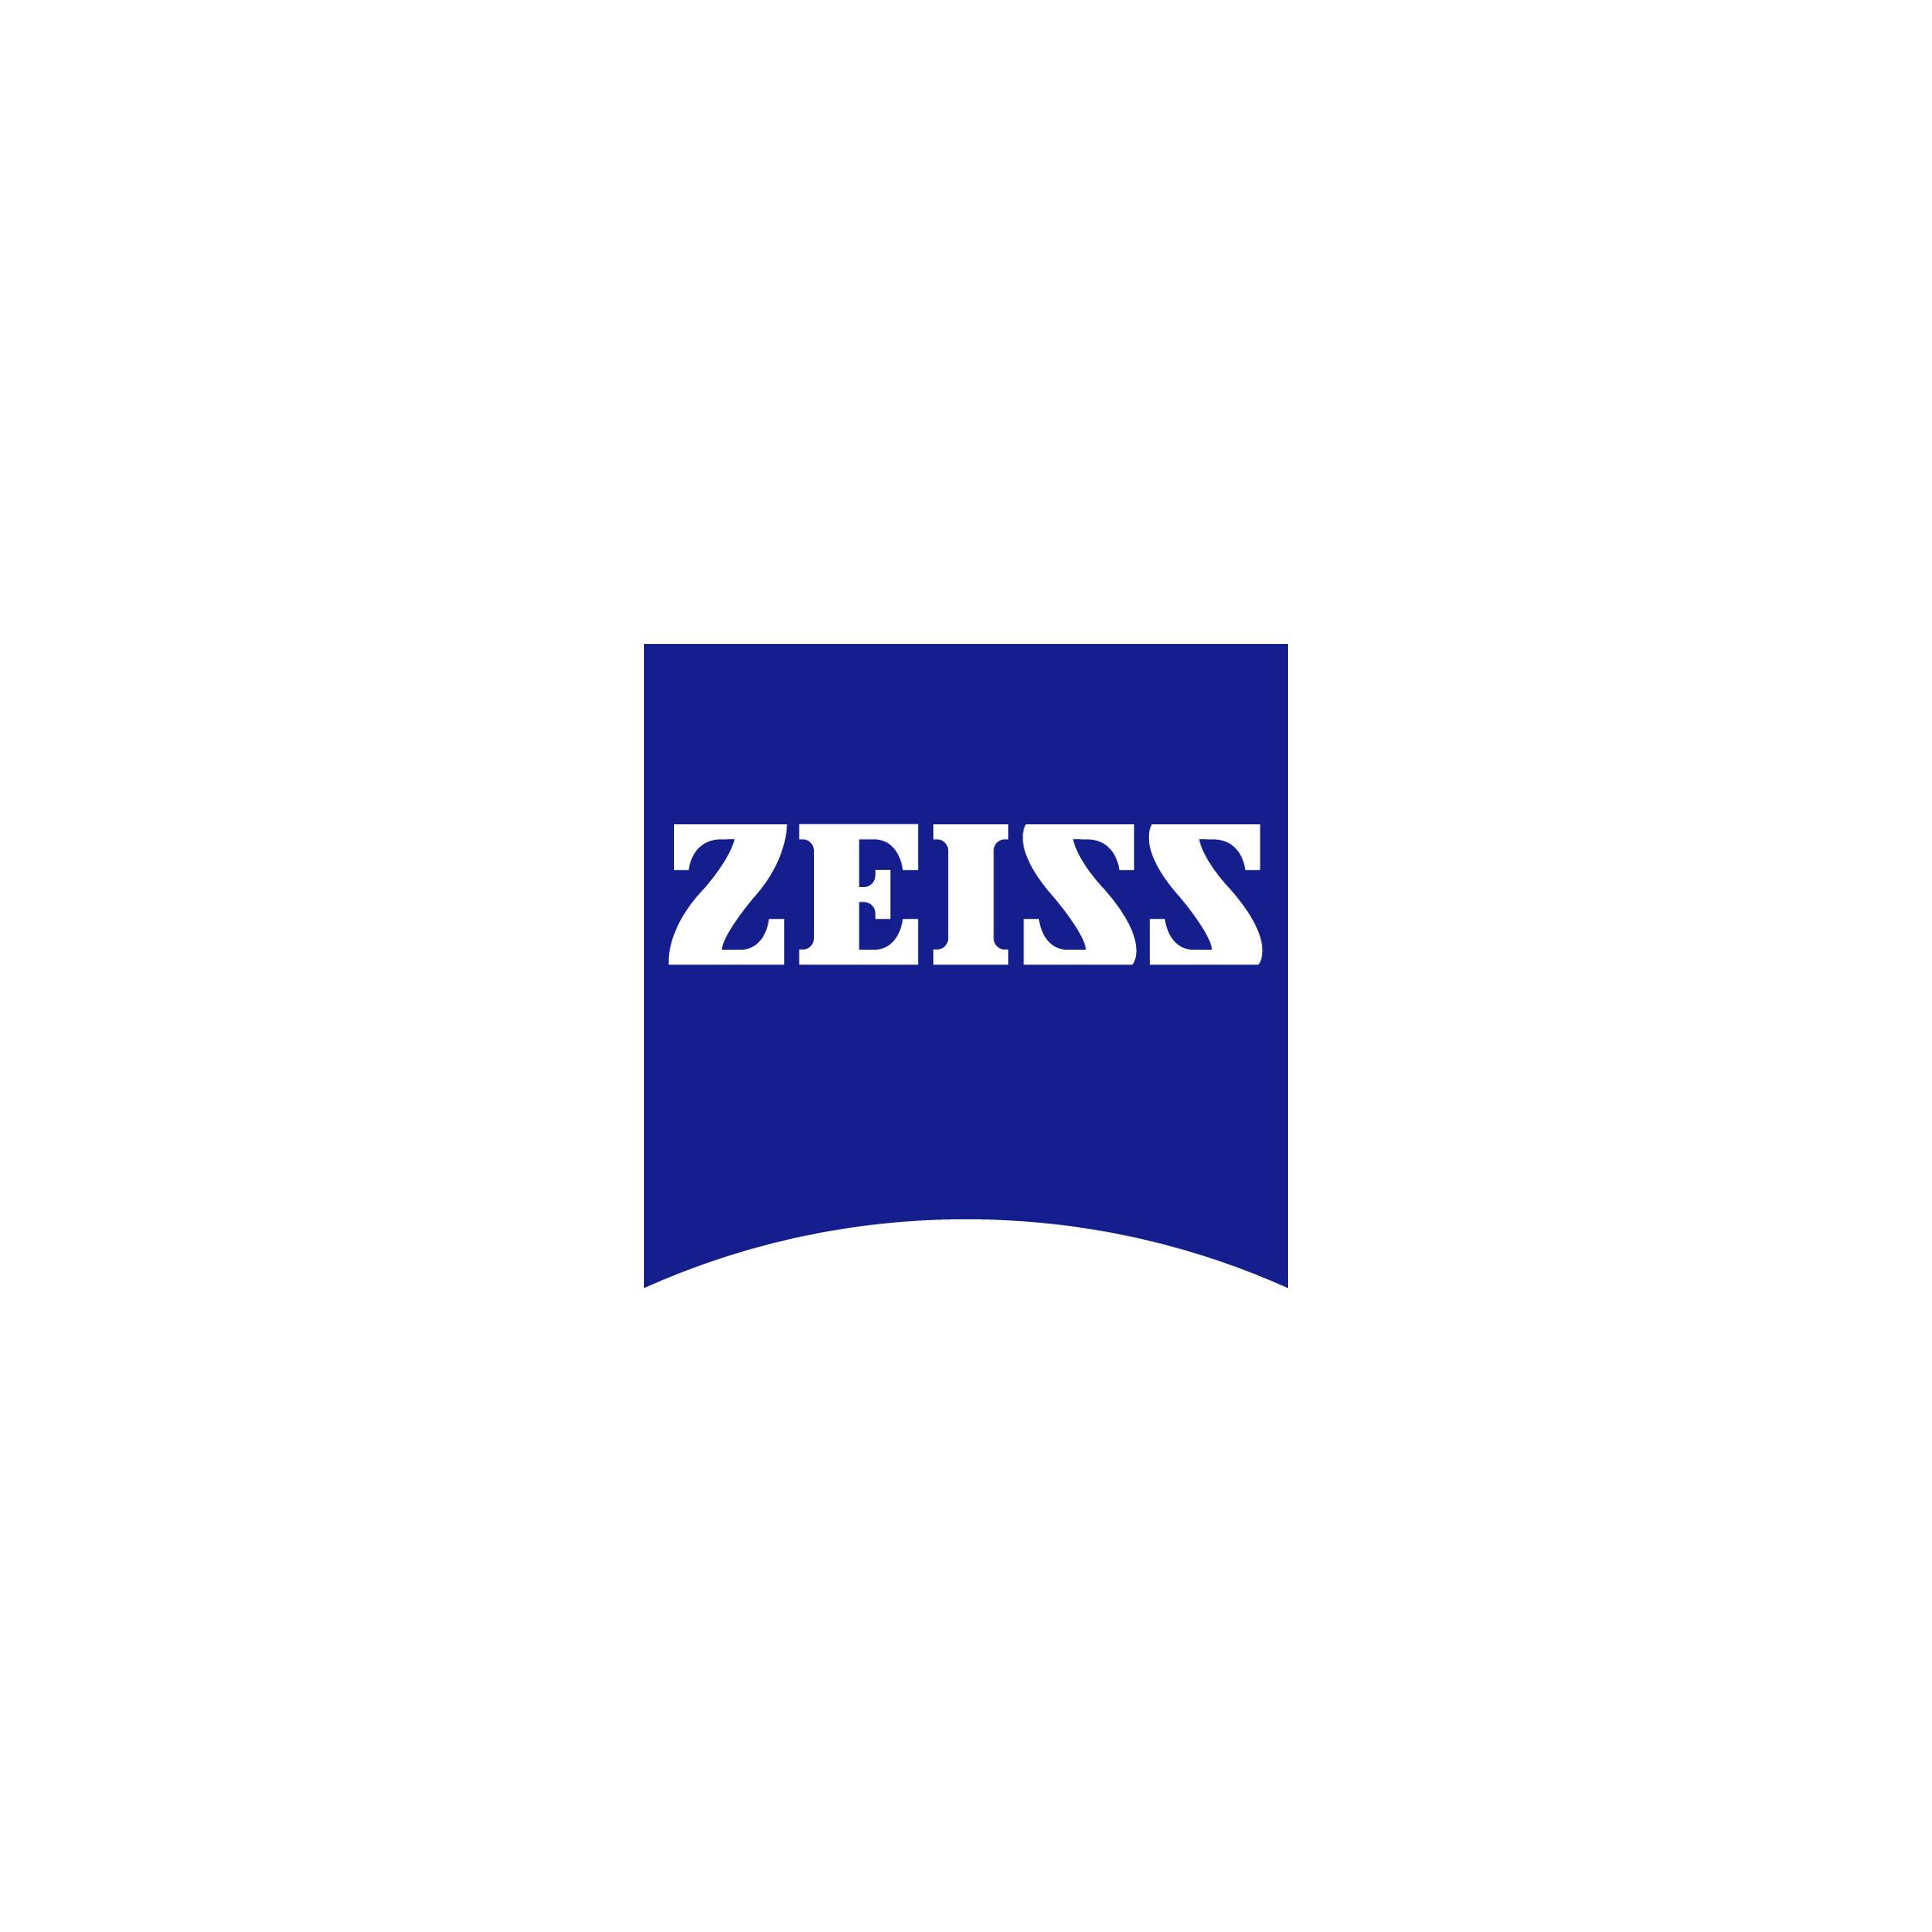 ZEISS Lenses - (Click the options below for more info)Progressive Individual 2Progressive Precision PortfolioProgressive Choice / Choice PlusOfficeLensDigital LensSun / Outdoor and PhotoFusionDuraVision and BlueProtect